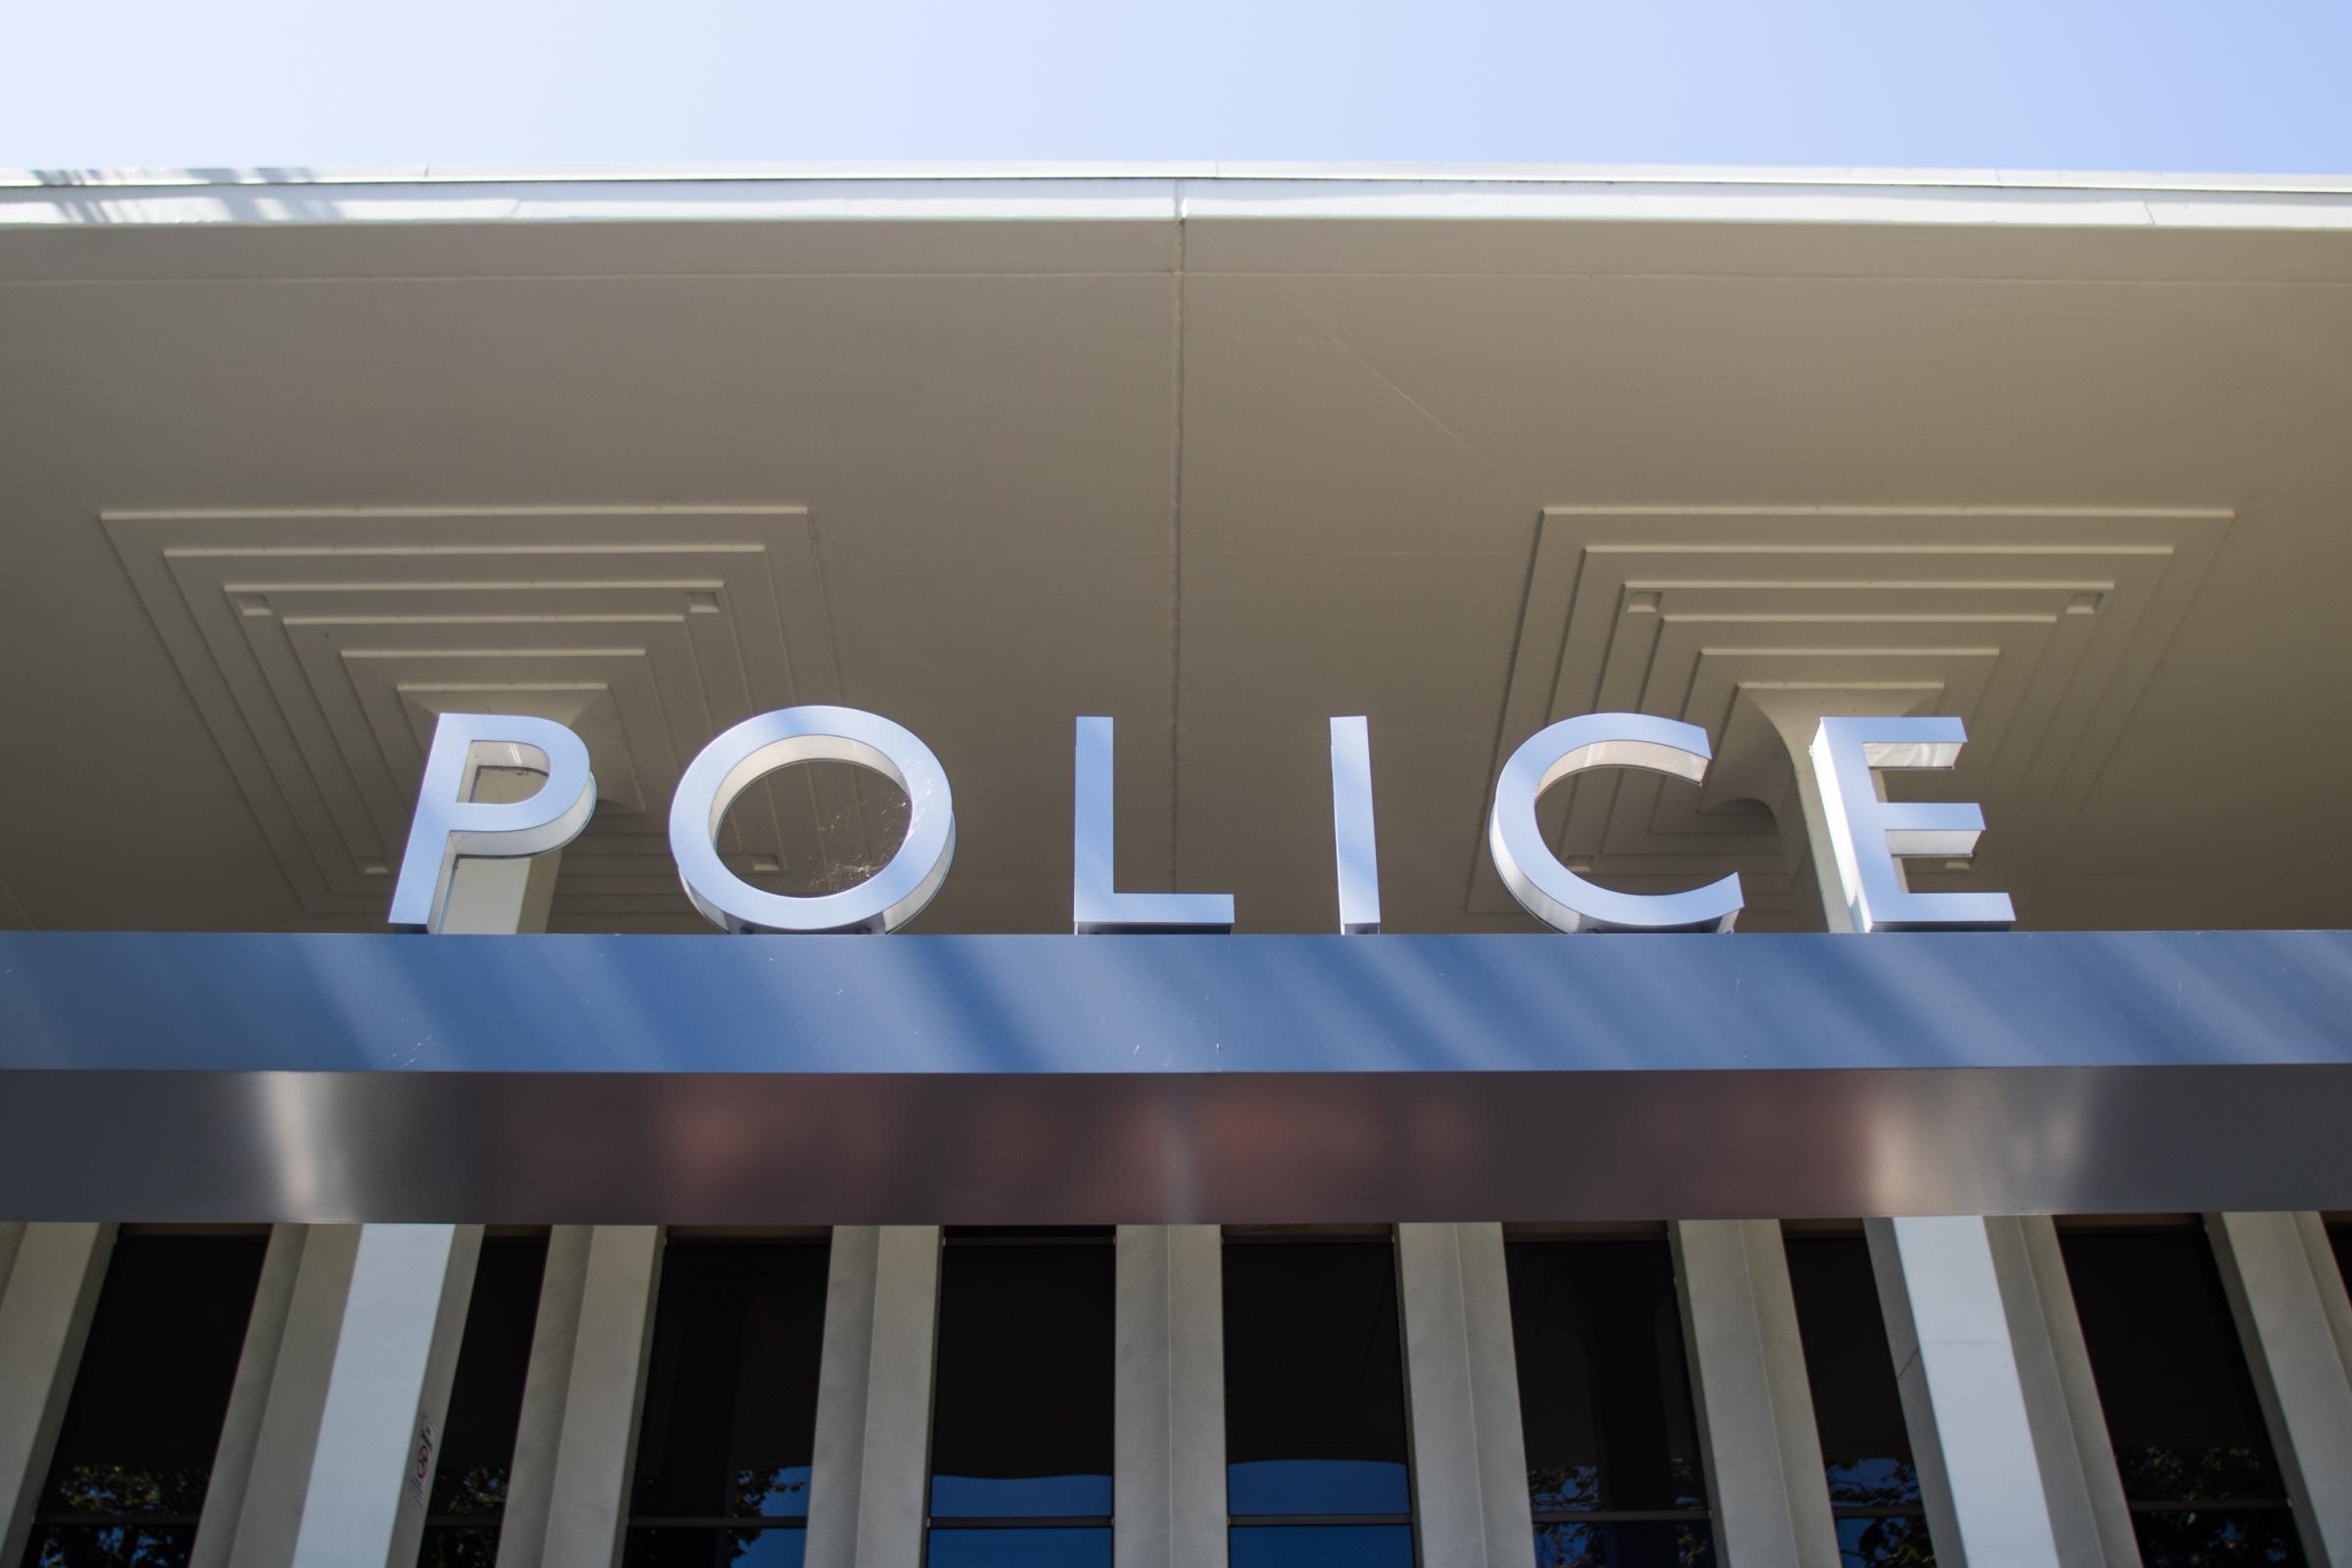 www.paloaltoonline.com: Police chiefs unite against hate crimes toward Asian Americans